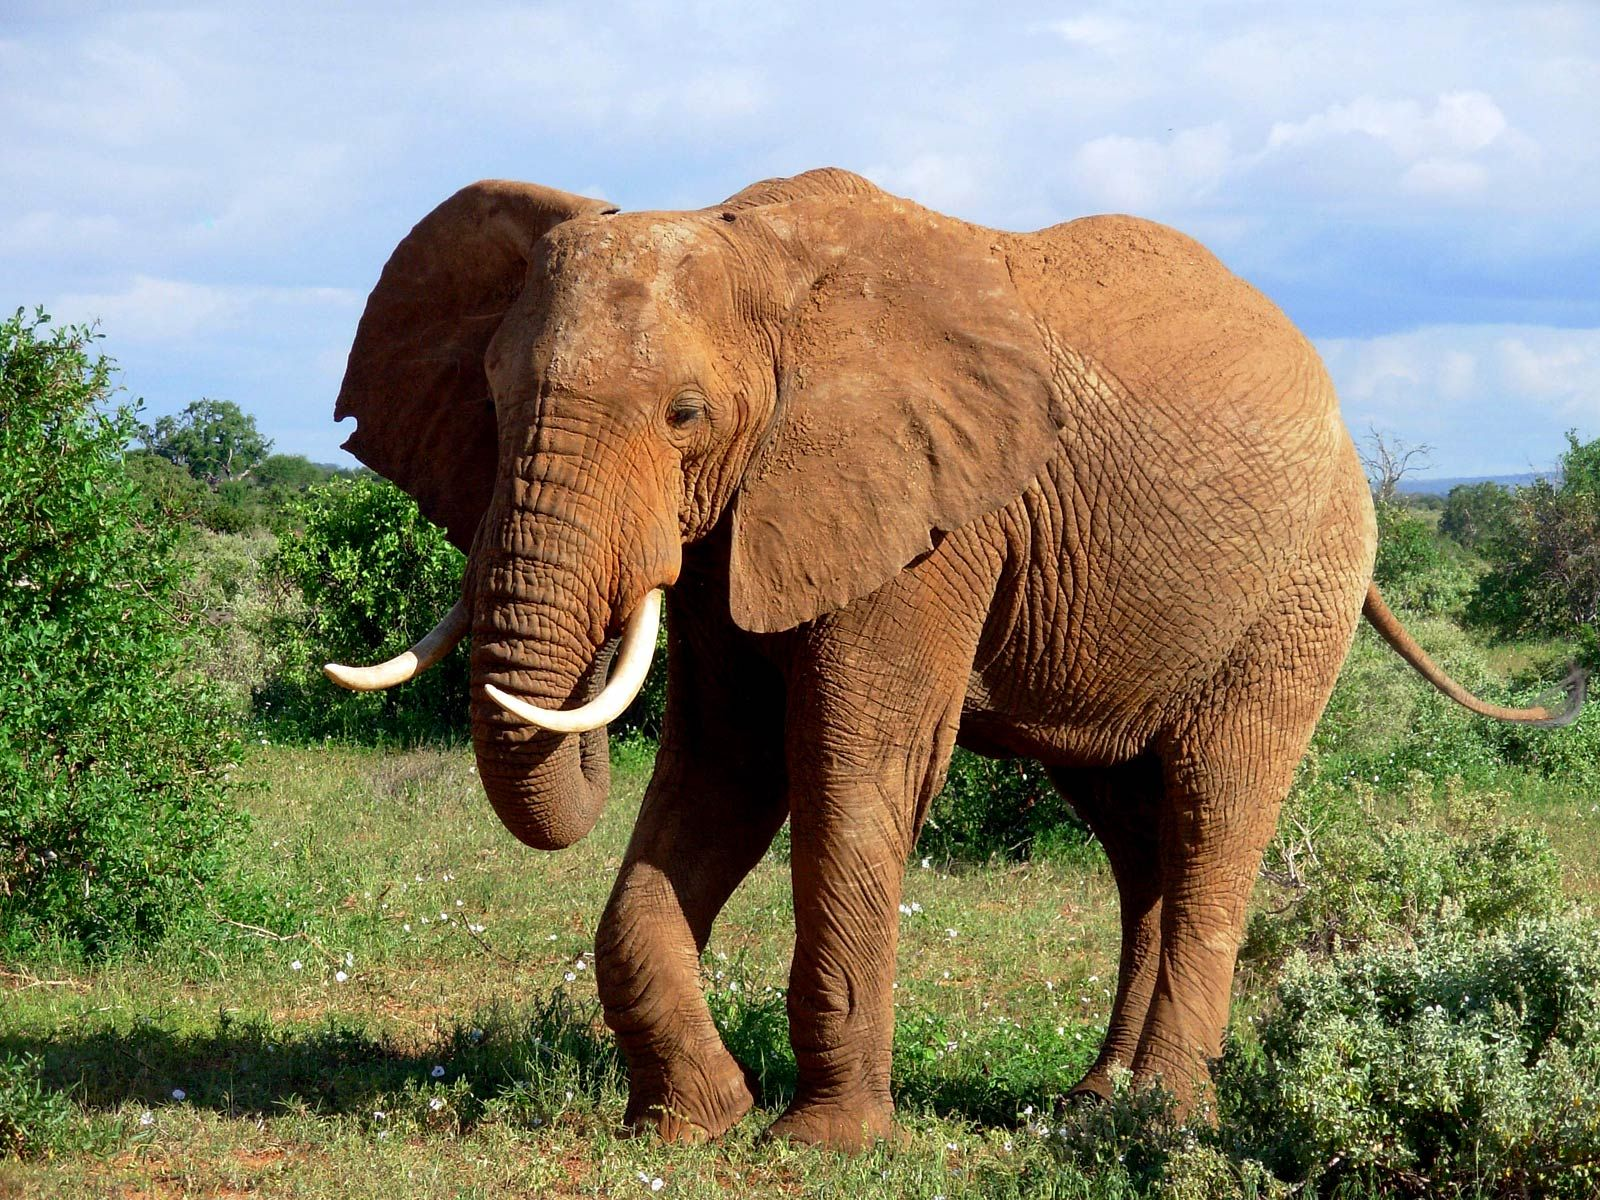 13 best elephant wallpapers images on pinterest   elephant